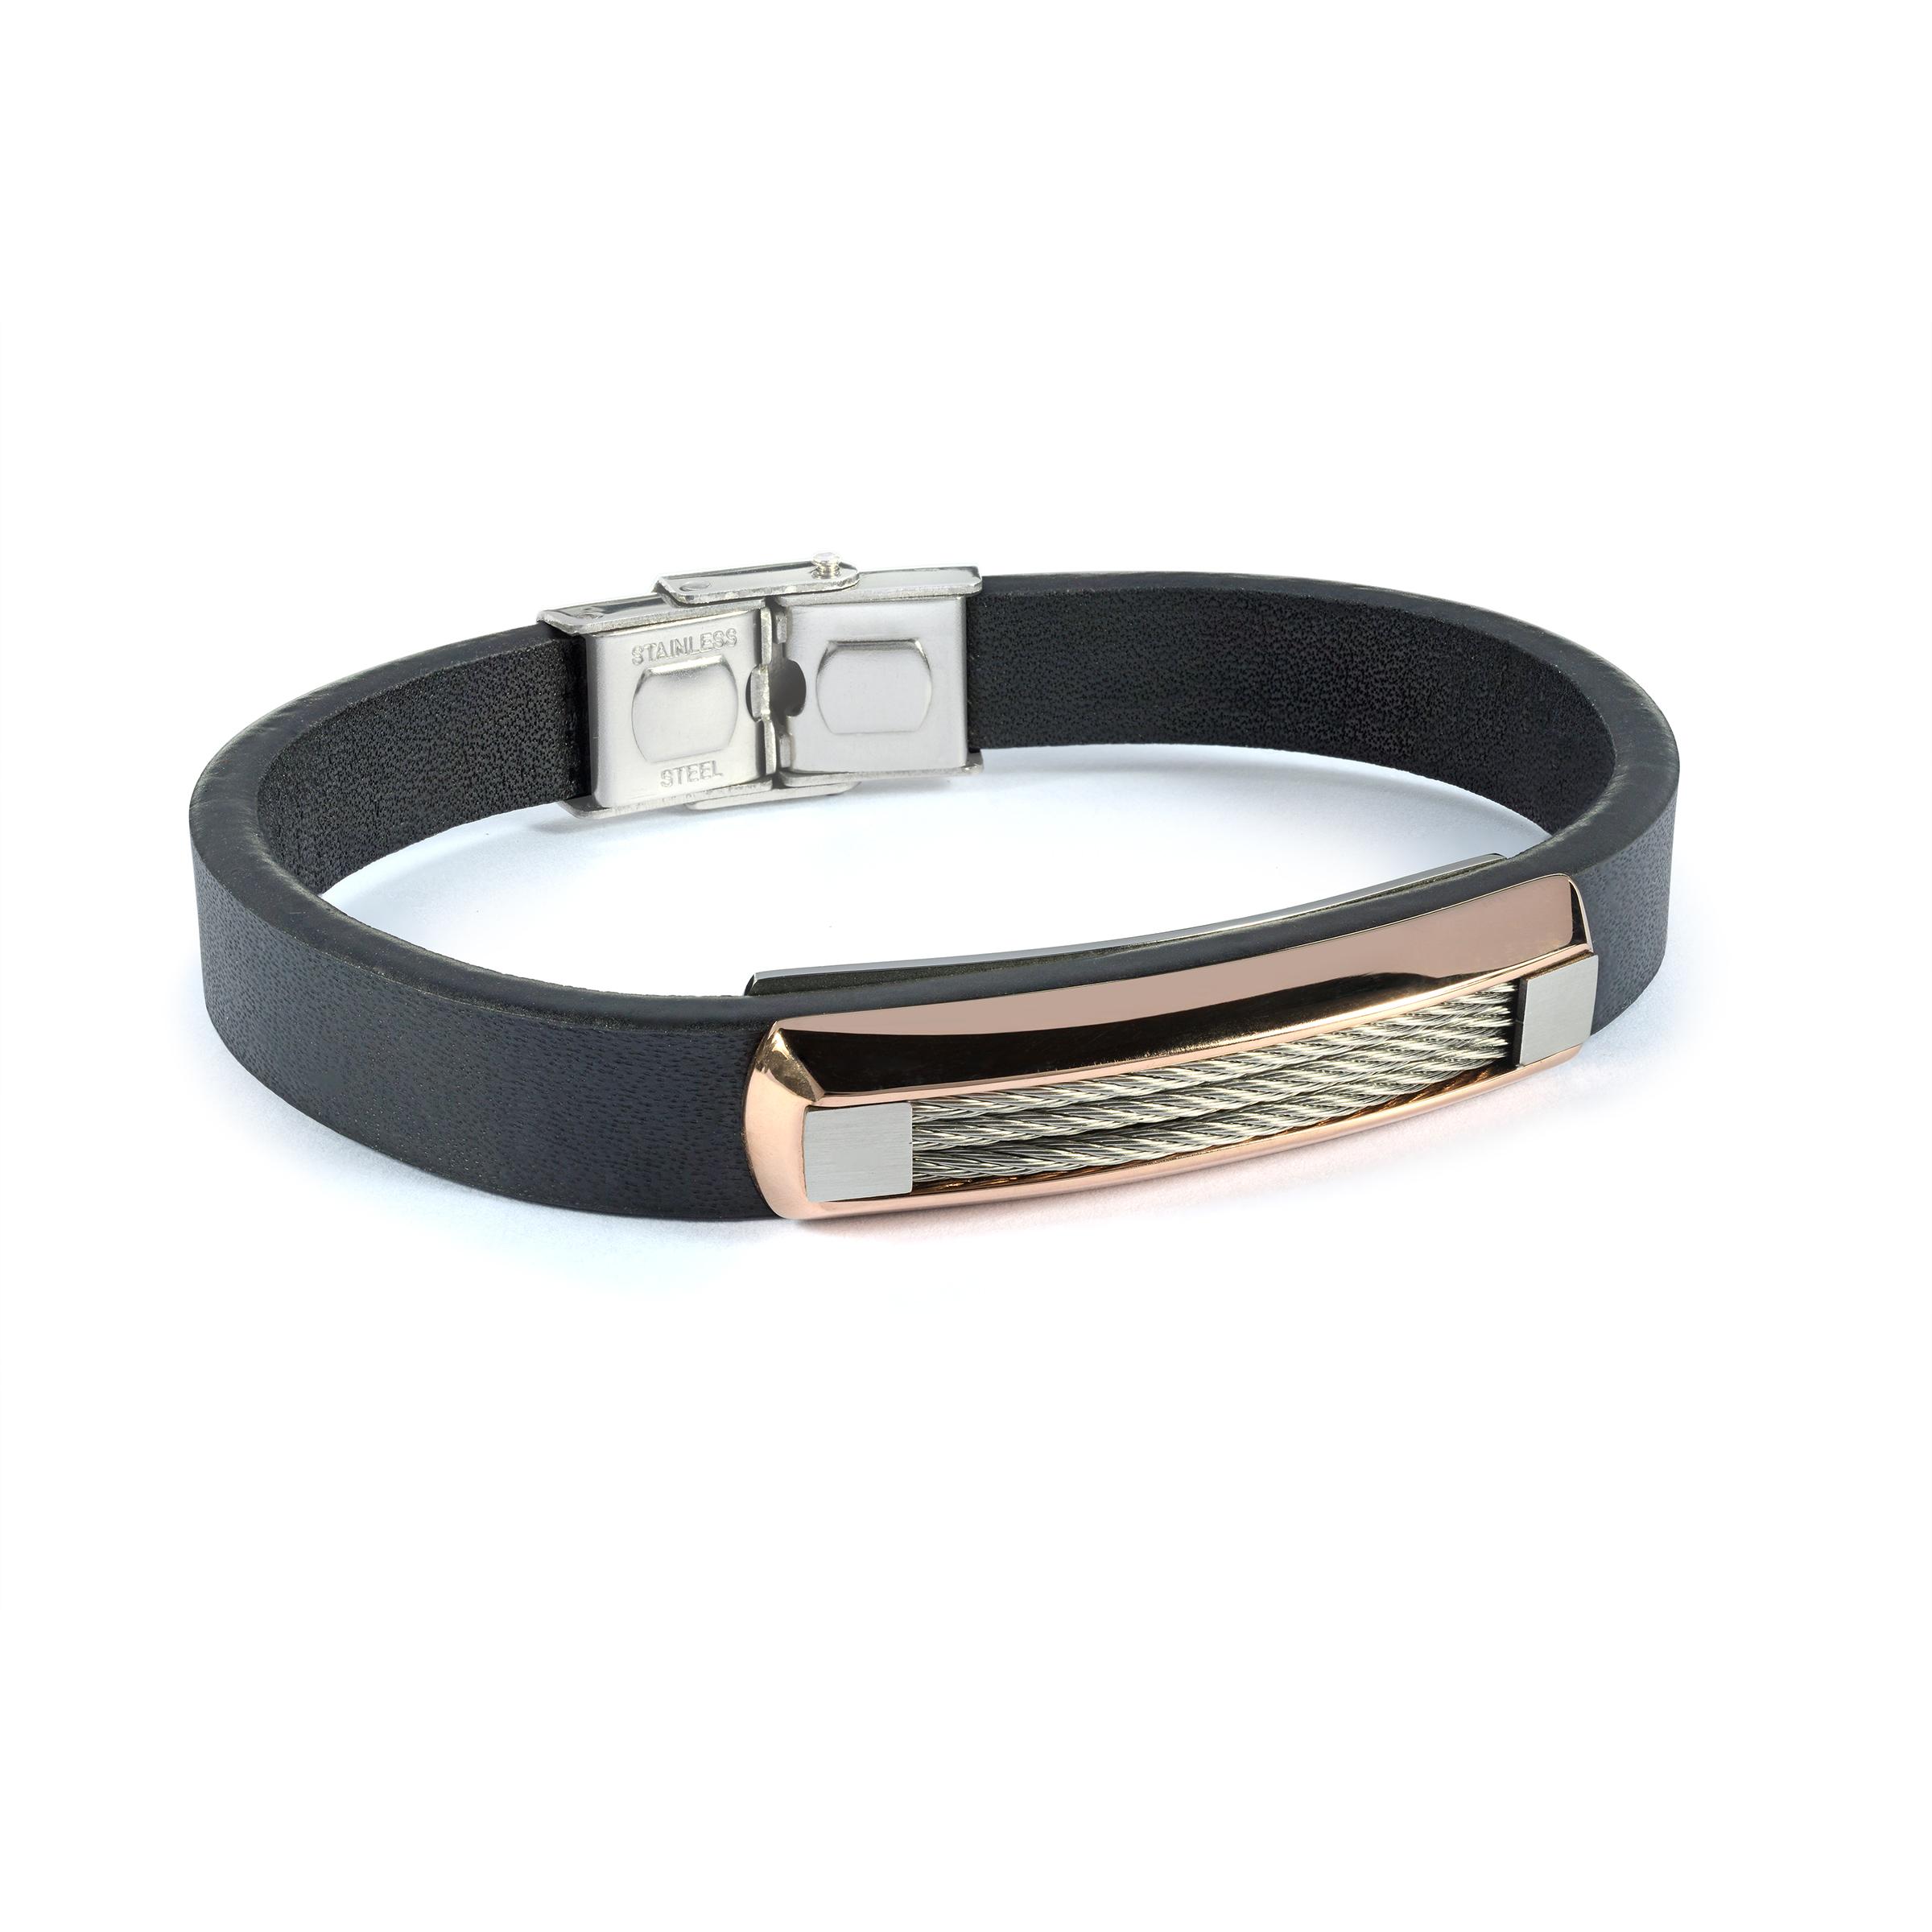 Bracelet en cuir - Acier inoxydable 2 tons & Câbles